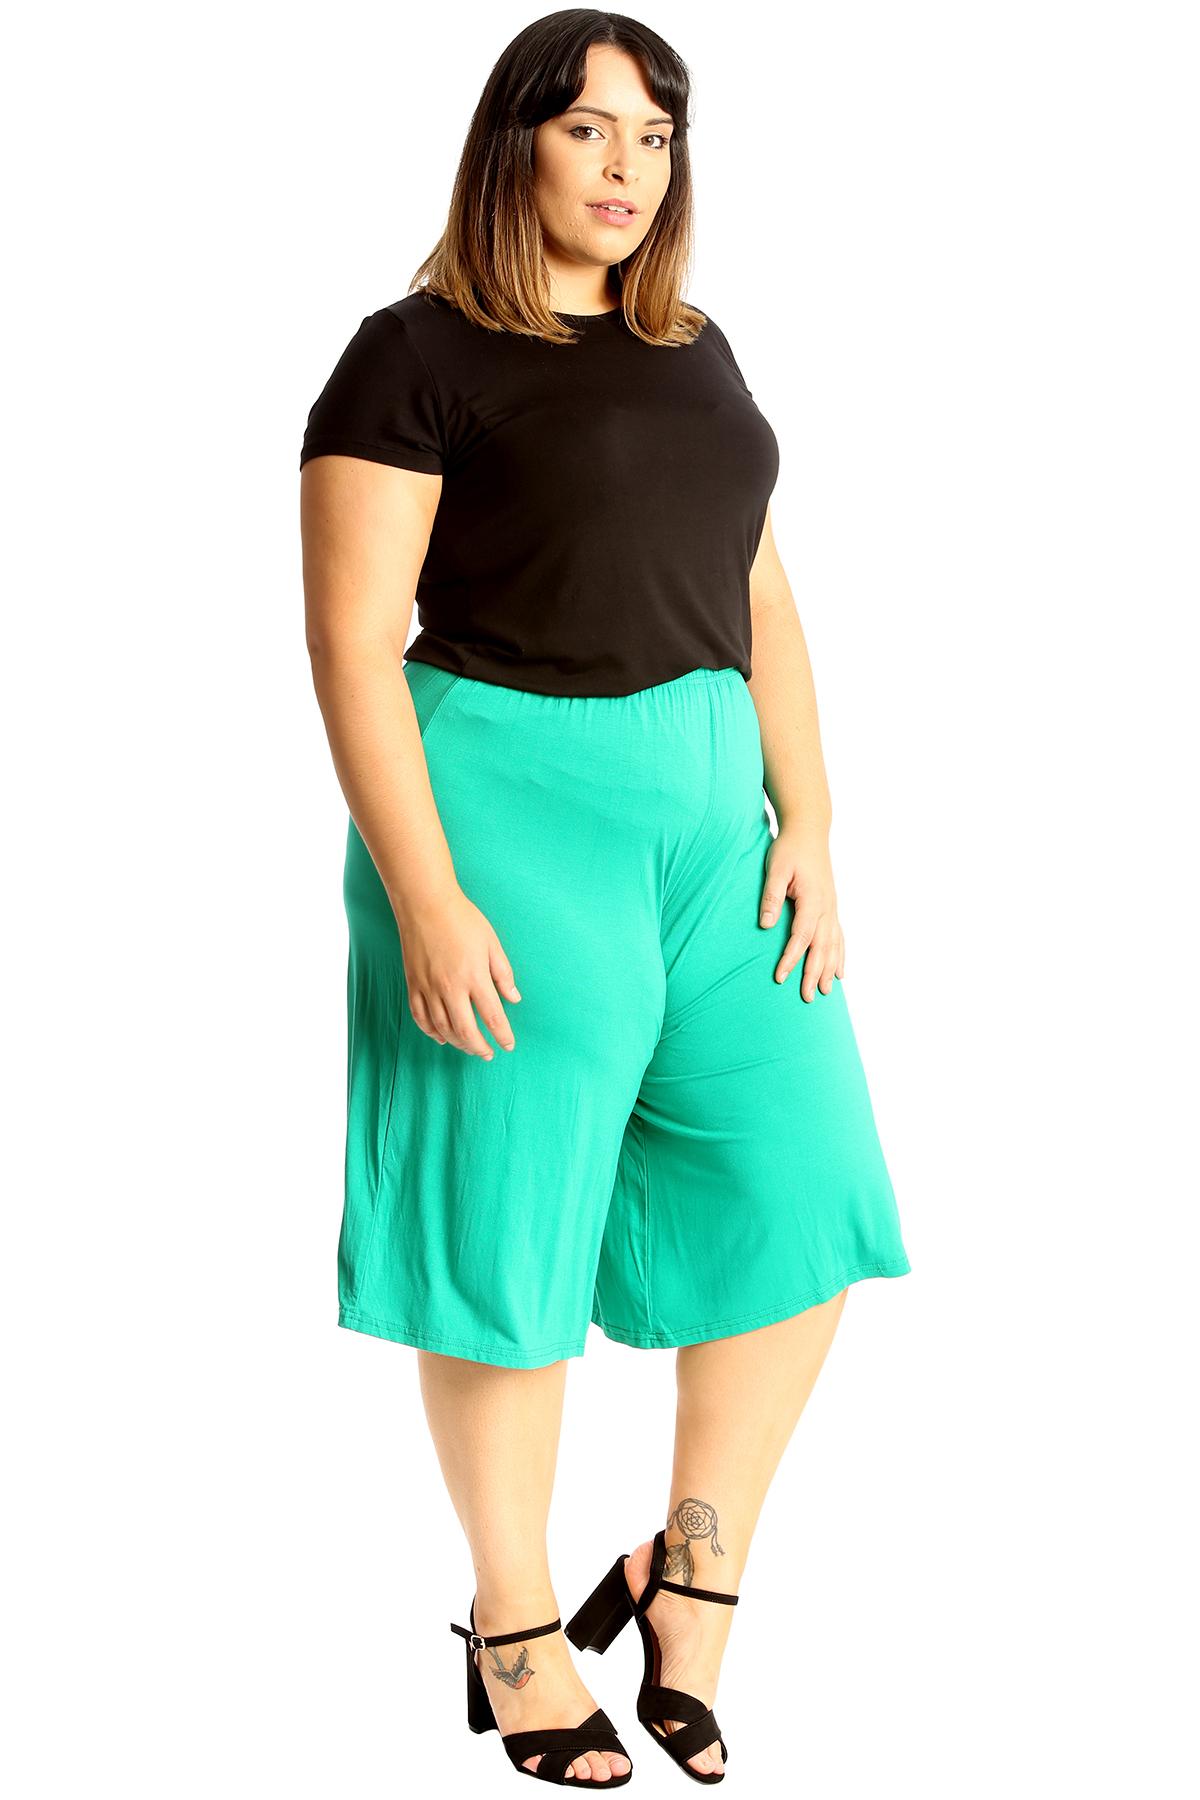 New-Womens-Plus-Size-Culottes-Ladies-Plain-Shorts-Palazzo-Elastic-Pants-Summer thumbnail 51